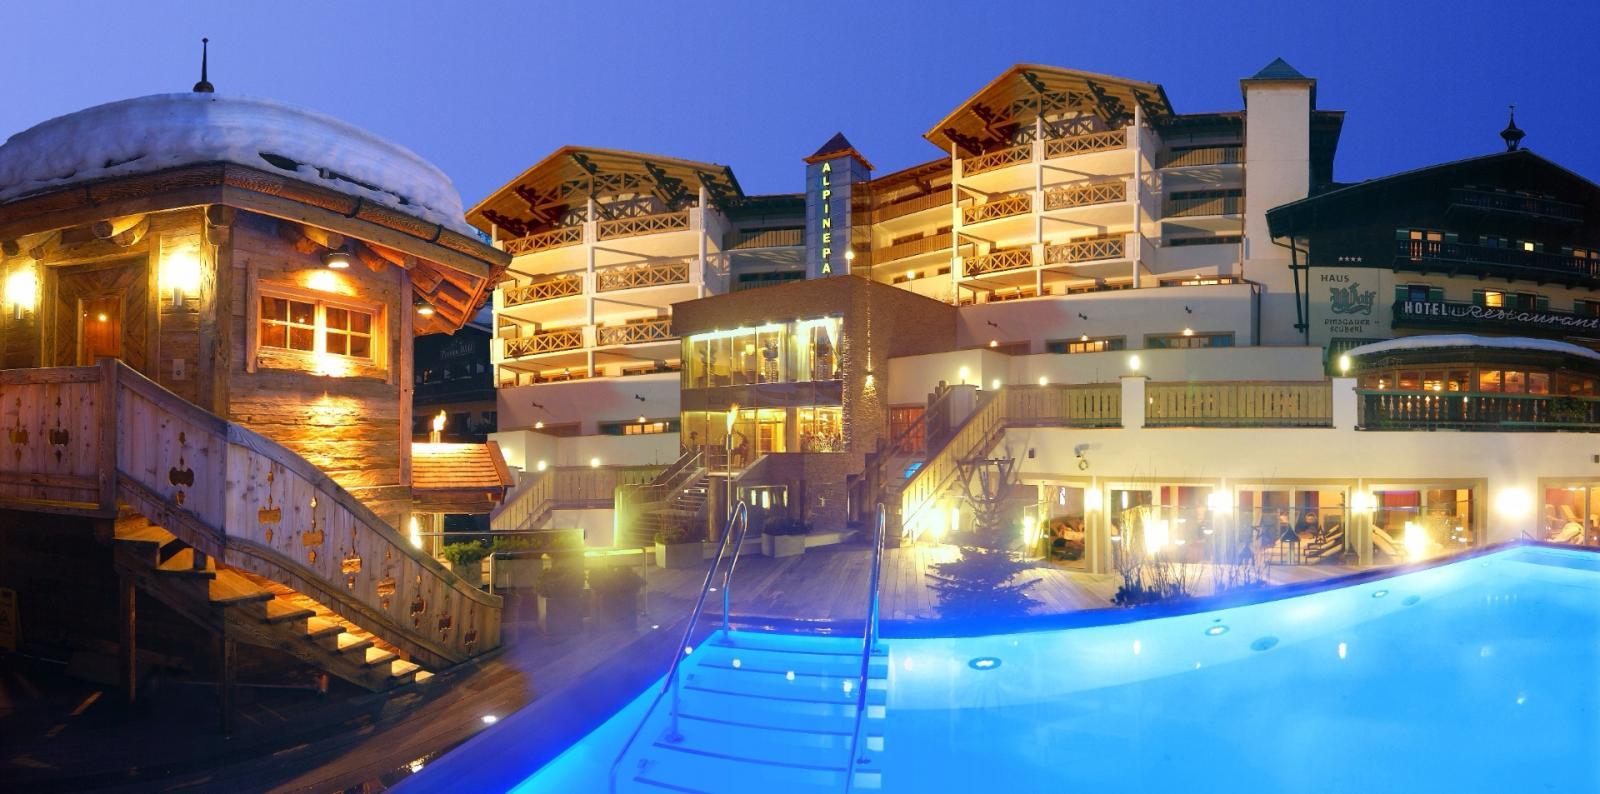 Hotel Alpine Palace New Balance Luxus Resort 5 S